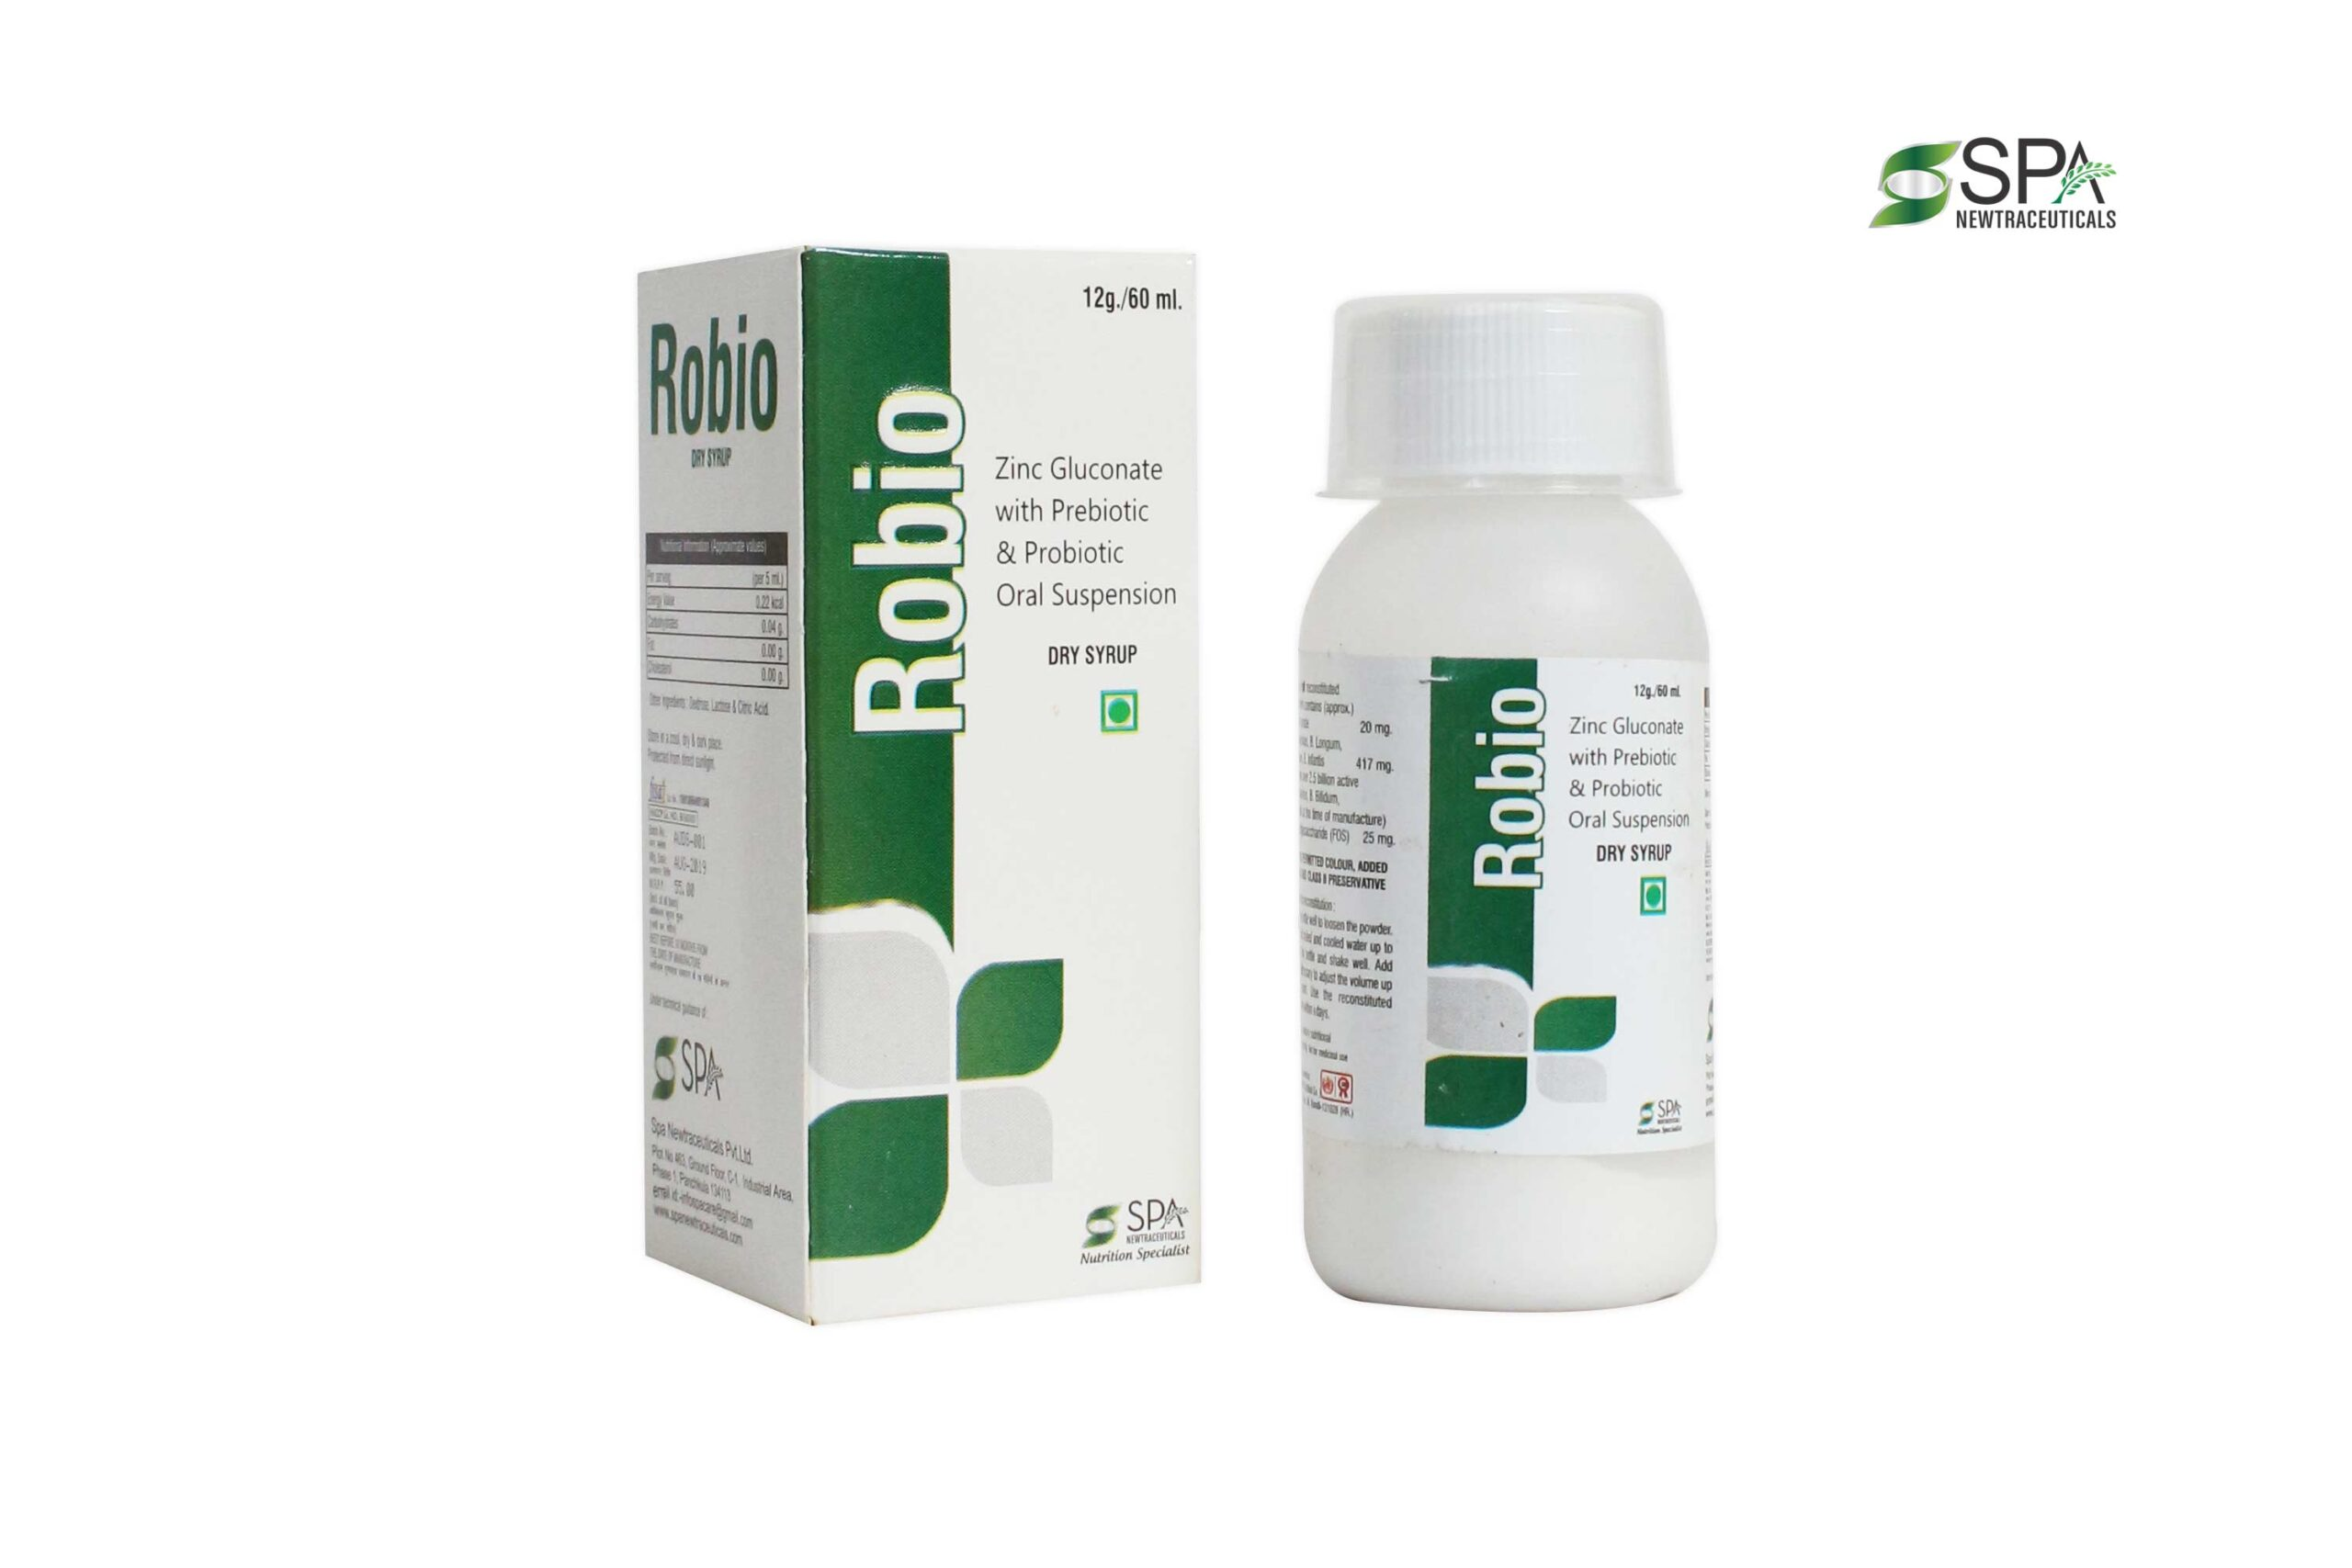 Robio-Dry-syrup